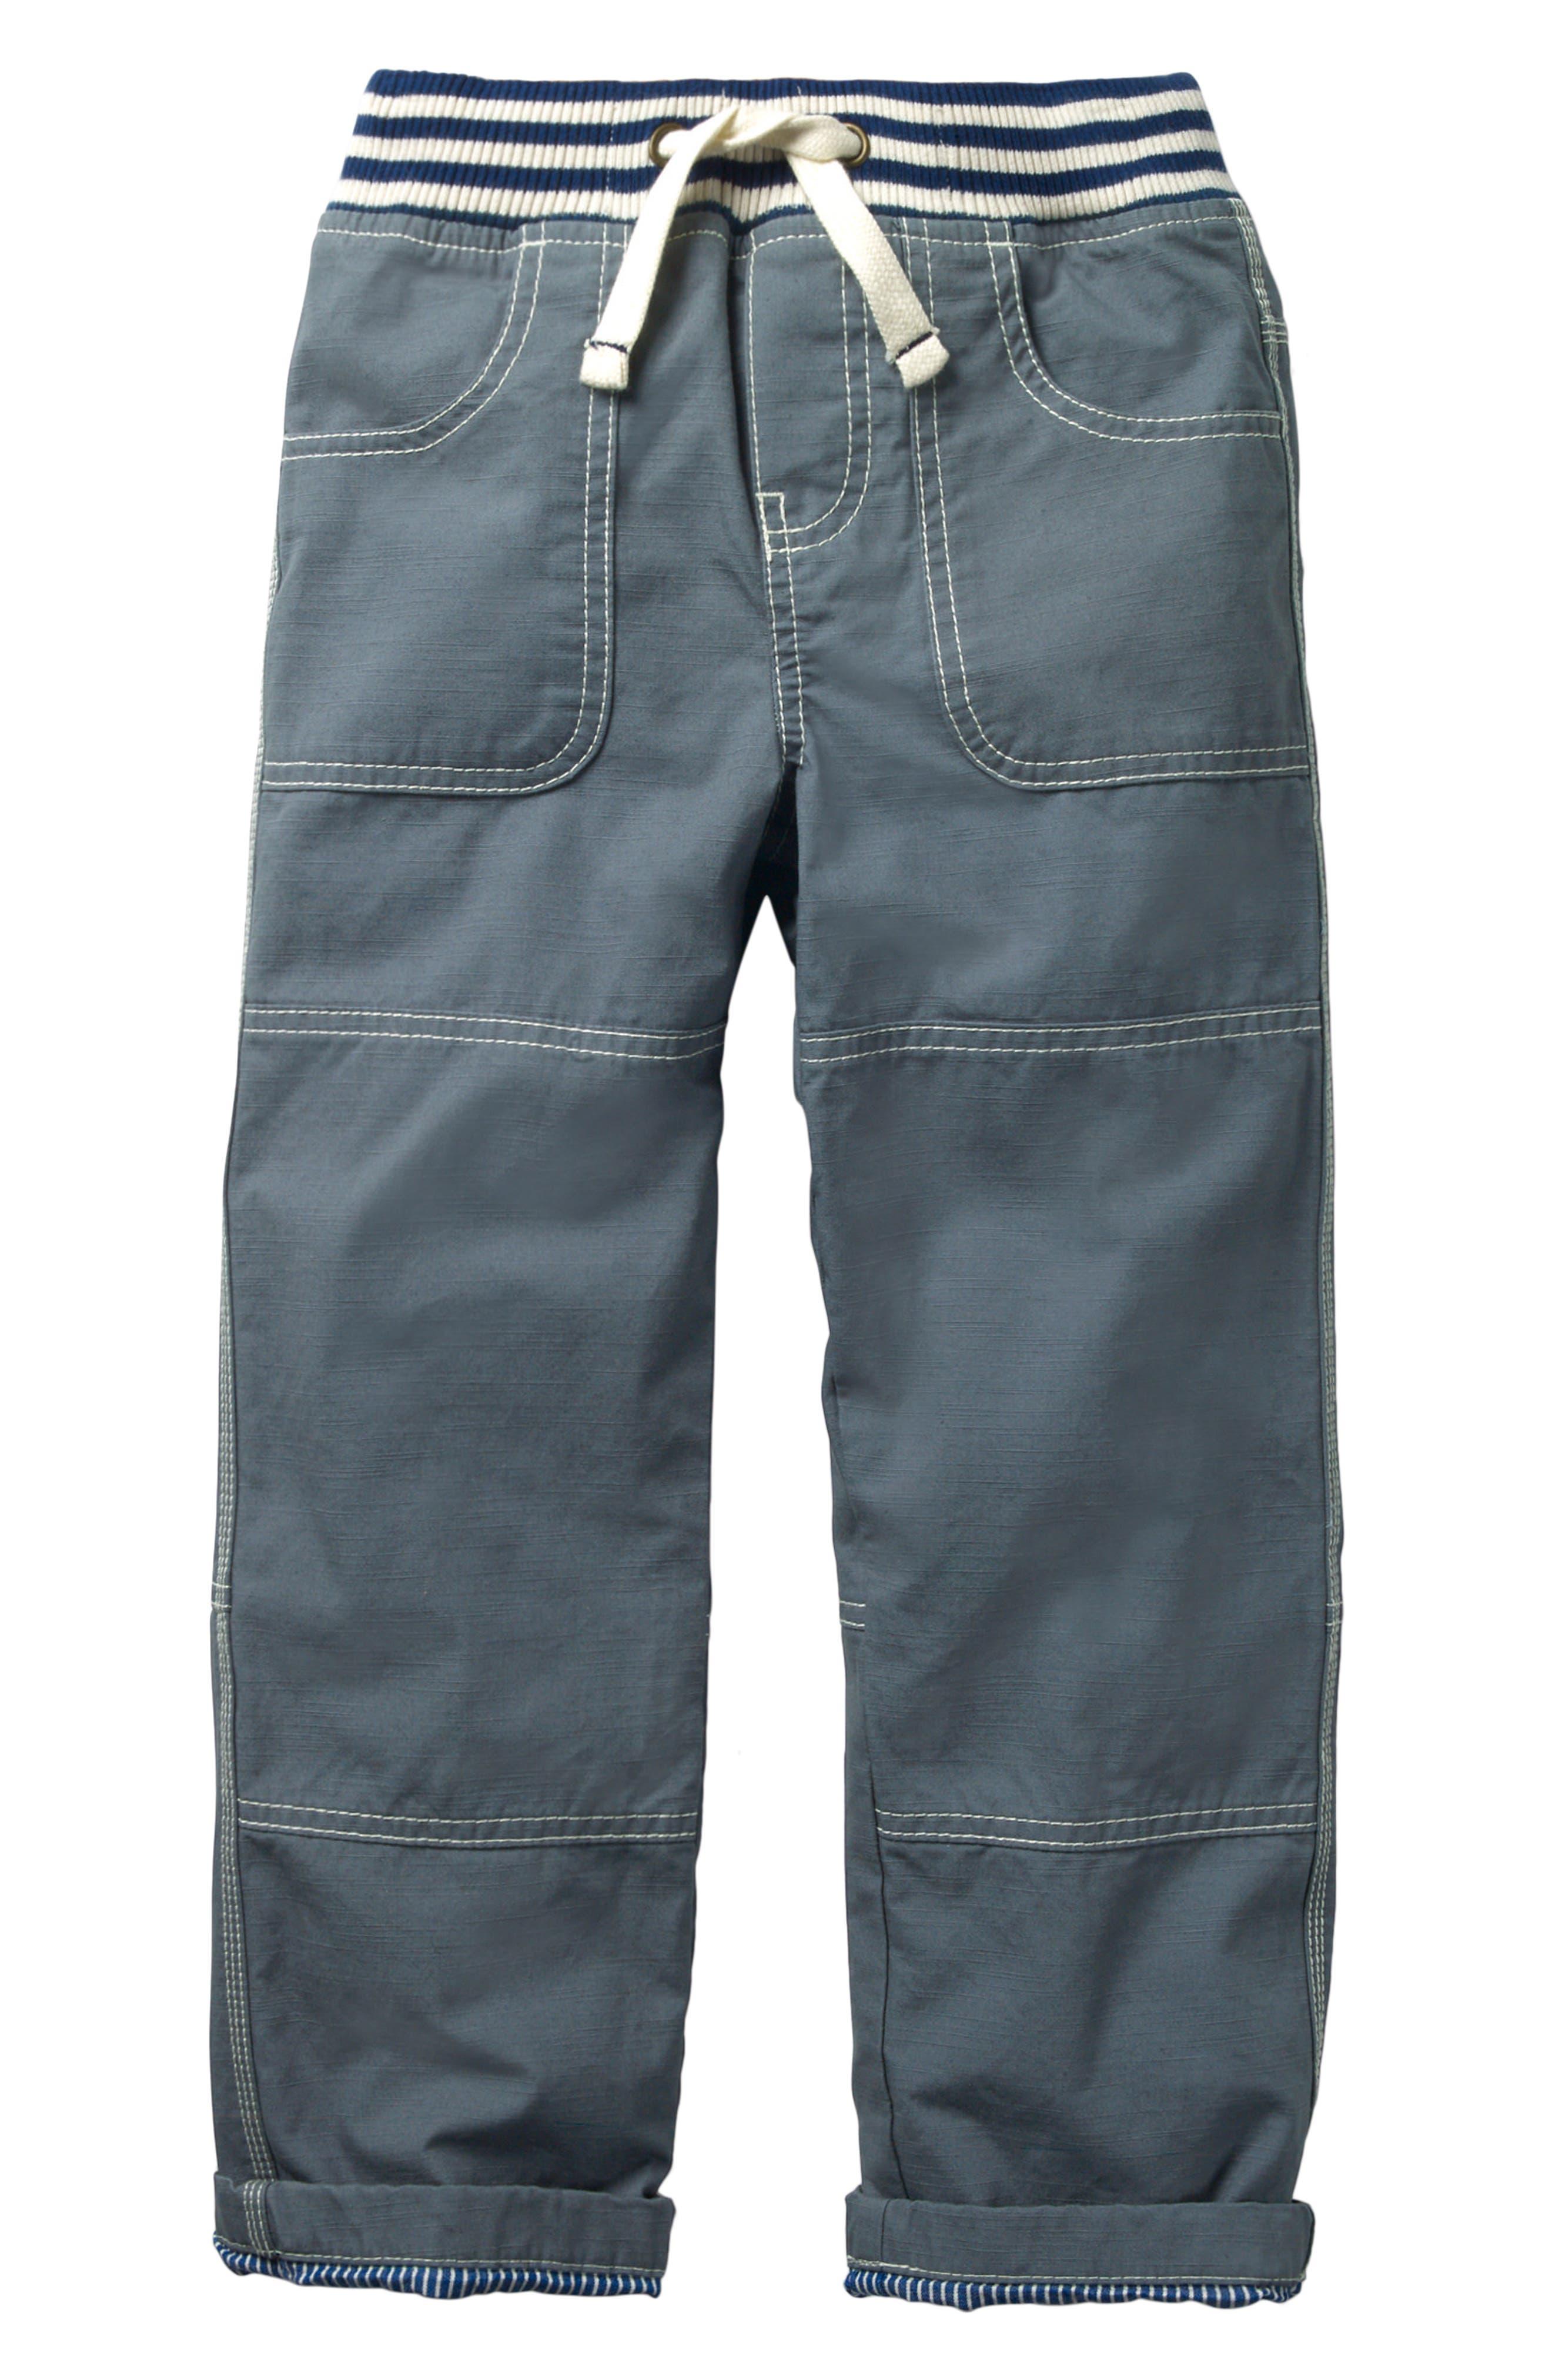 Lined Mariner Pants,                         Main,                         color, Cobble Grey